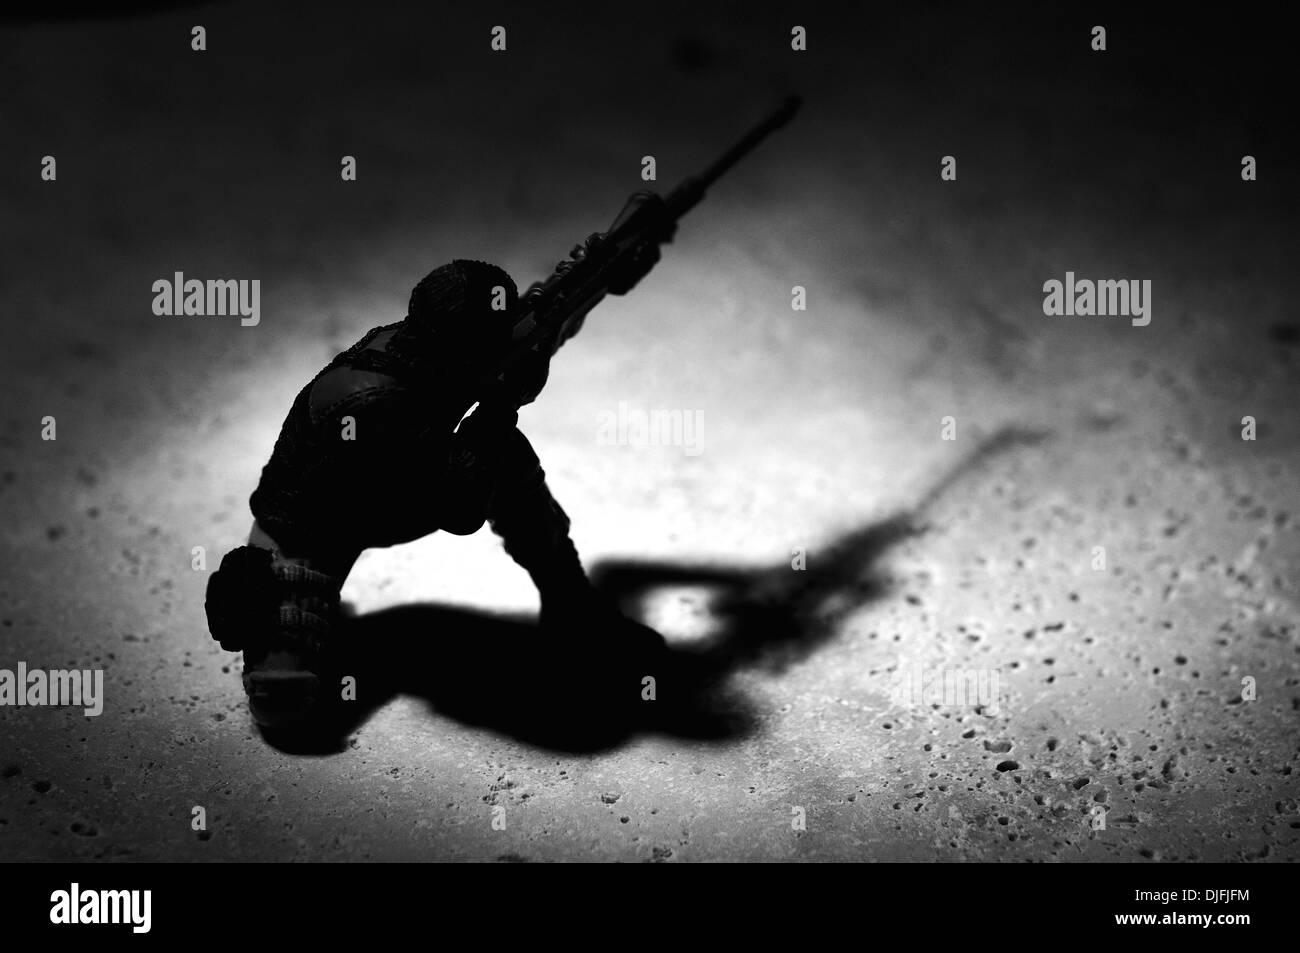 Sniper taking aim - Stock Image